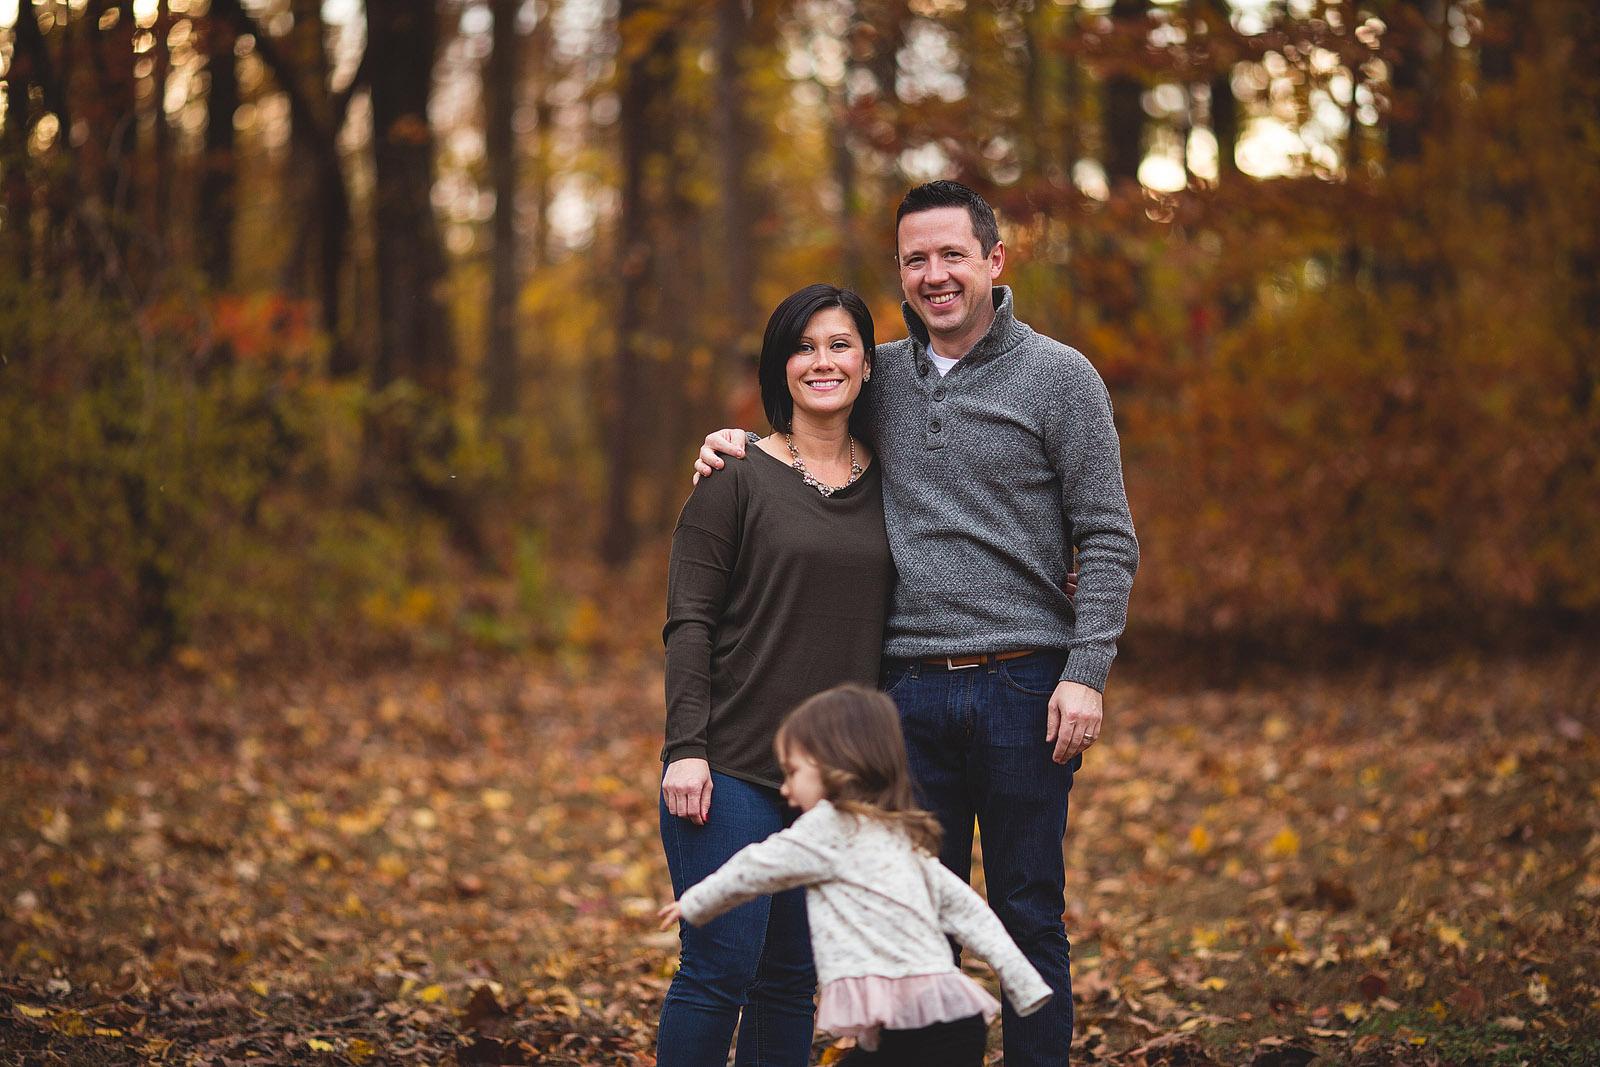 Family Photographer in Raleigh | Victoria Vasilyeva